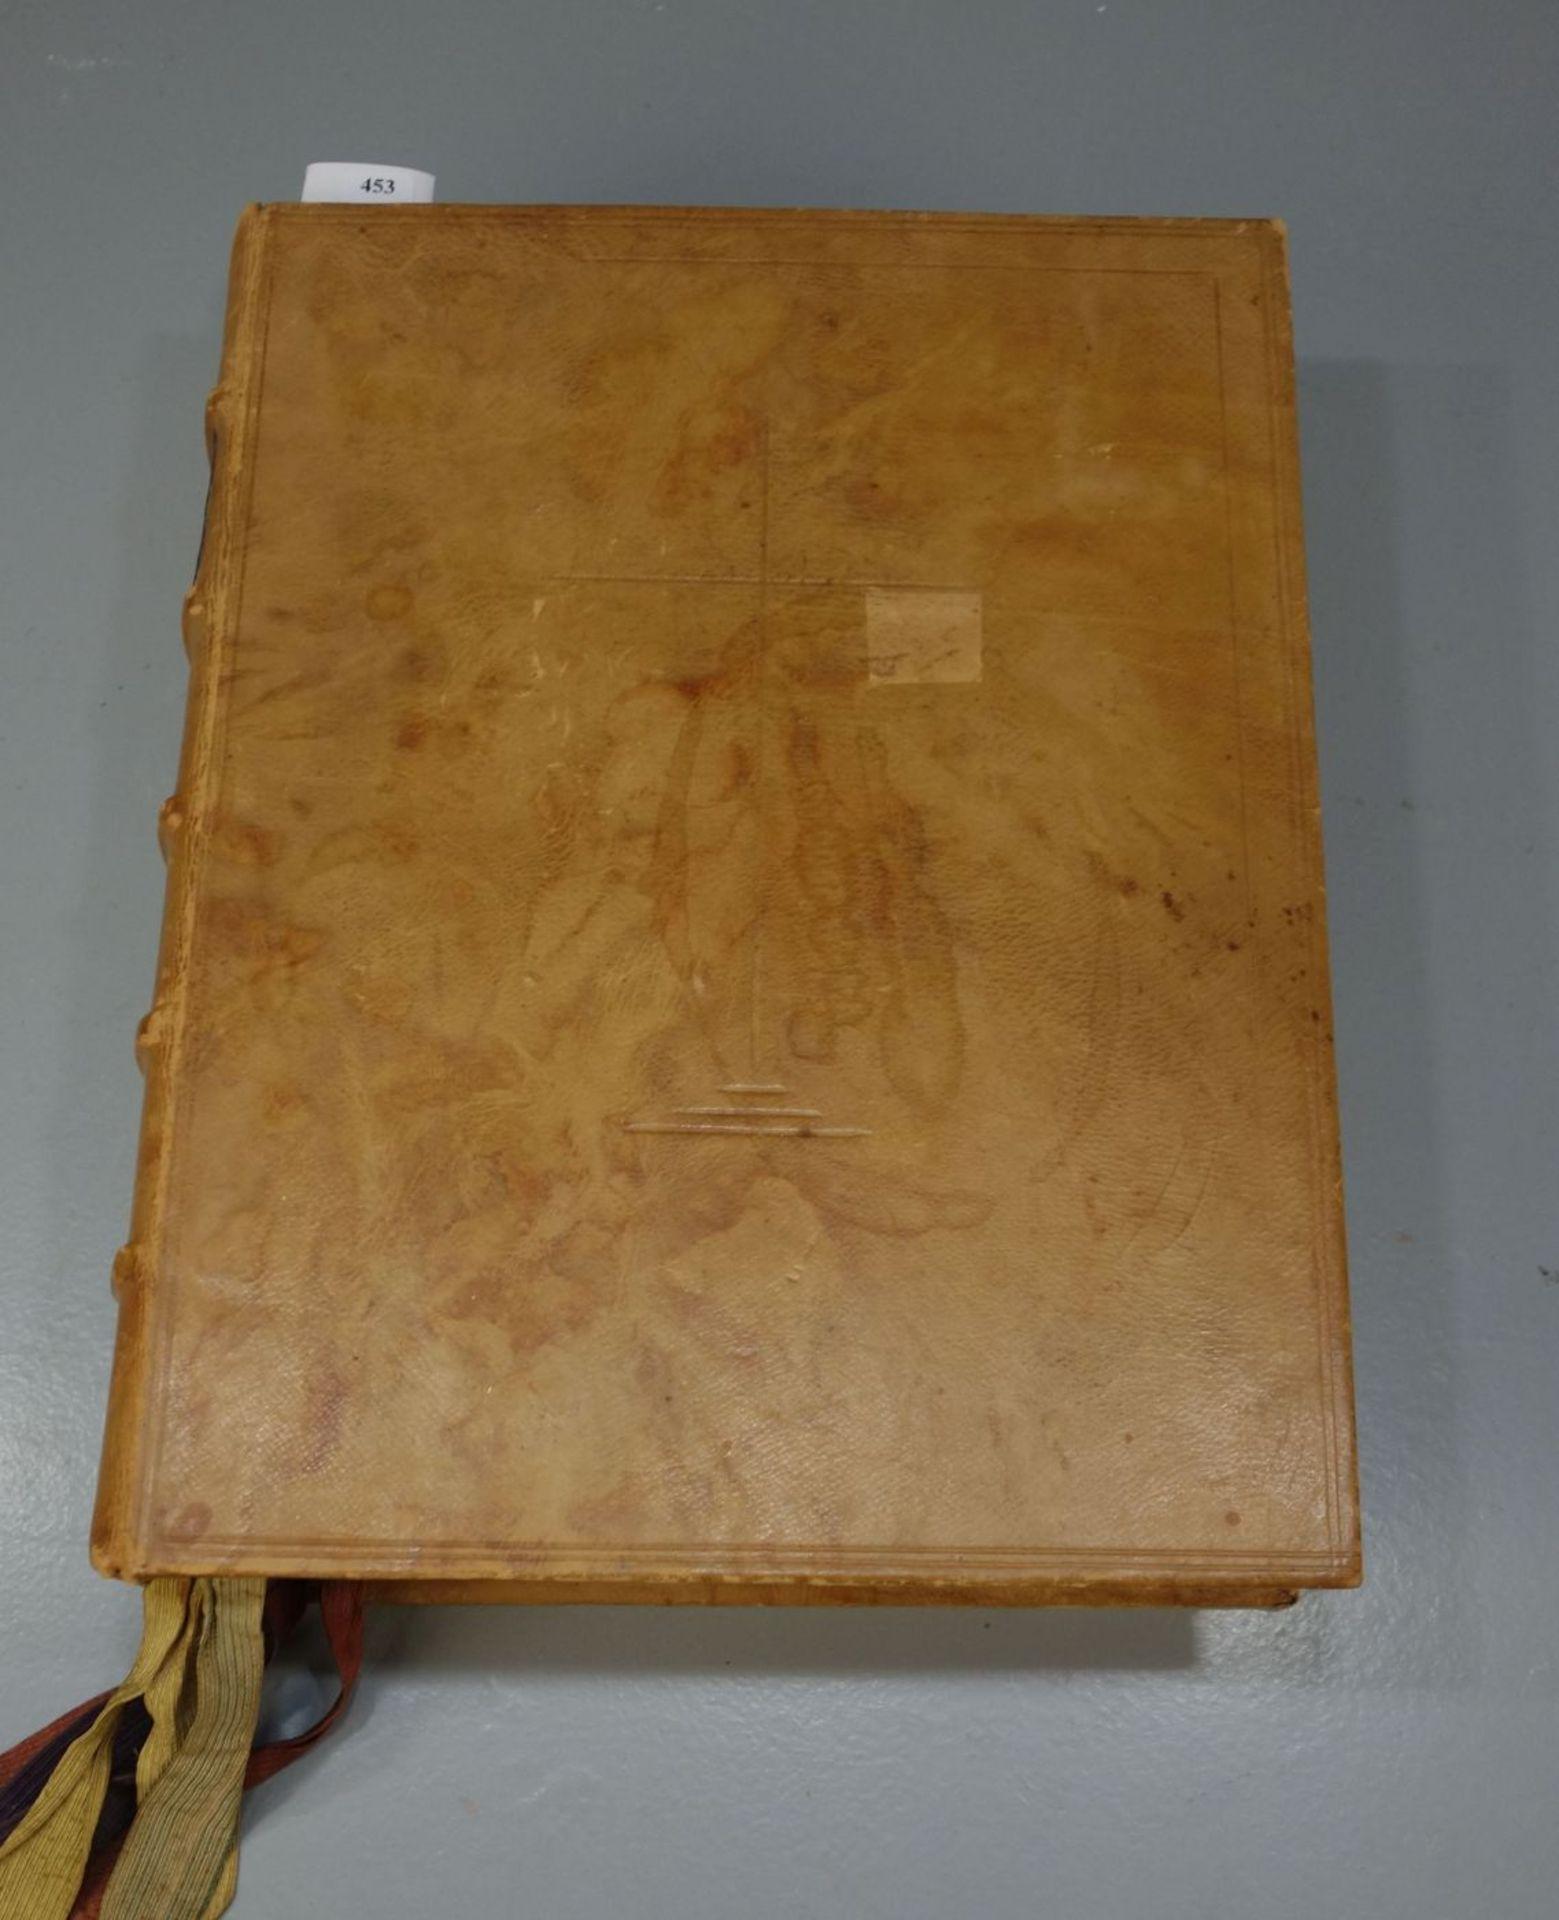 BIBEL IM LEDEREINBAND - Bild 2 aus 8